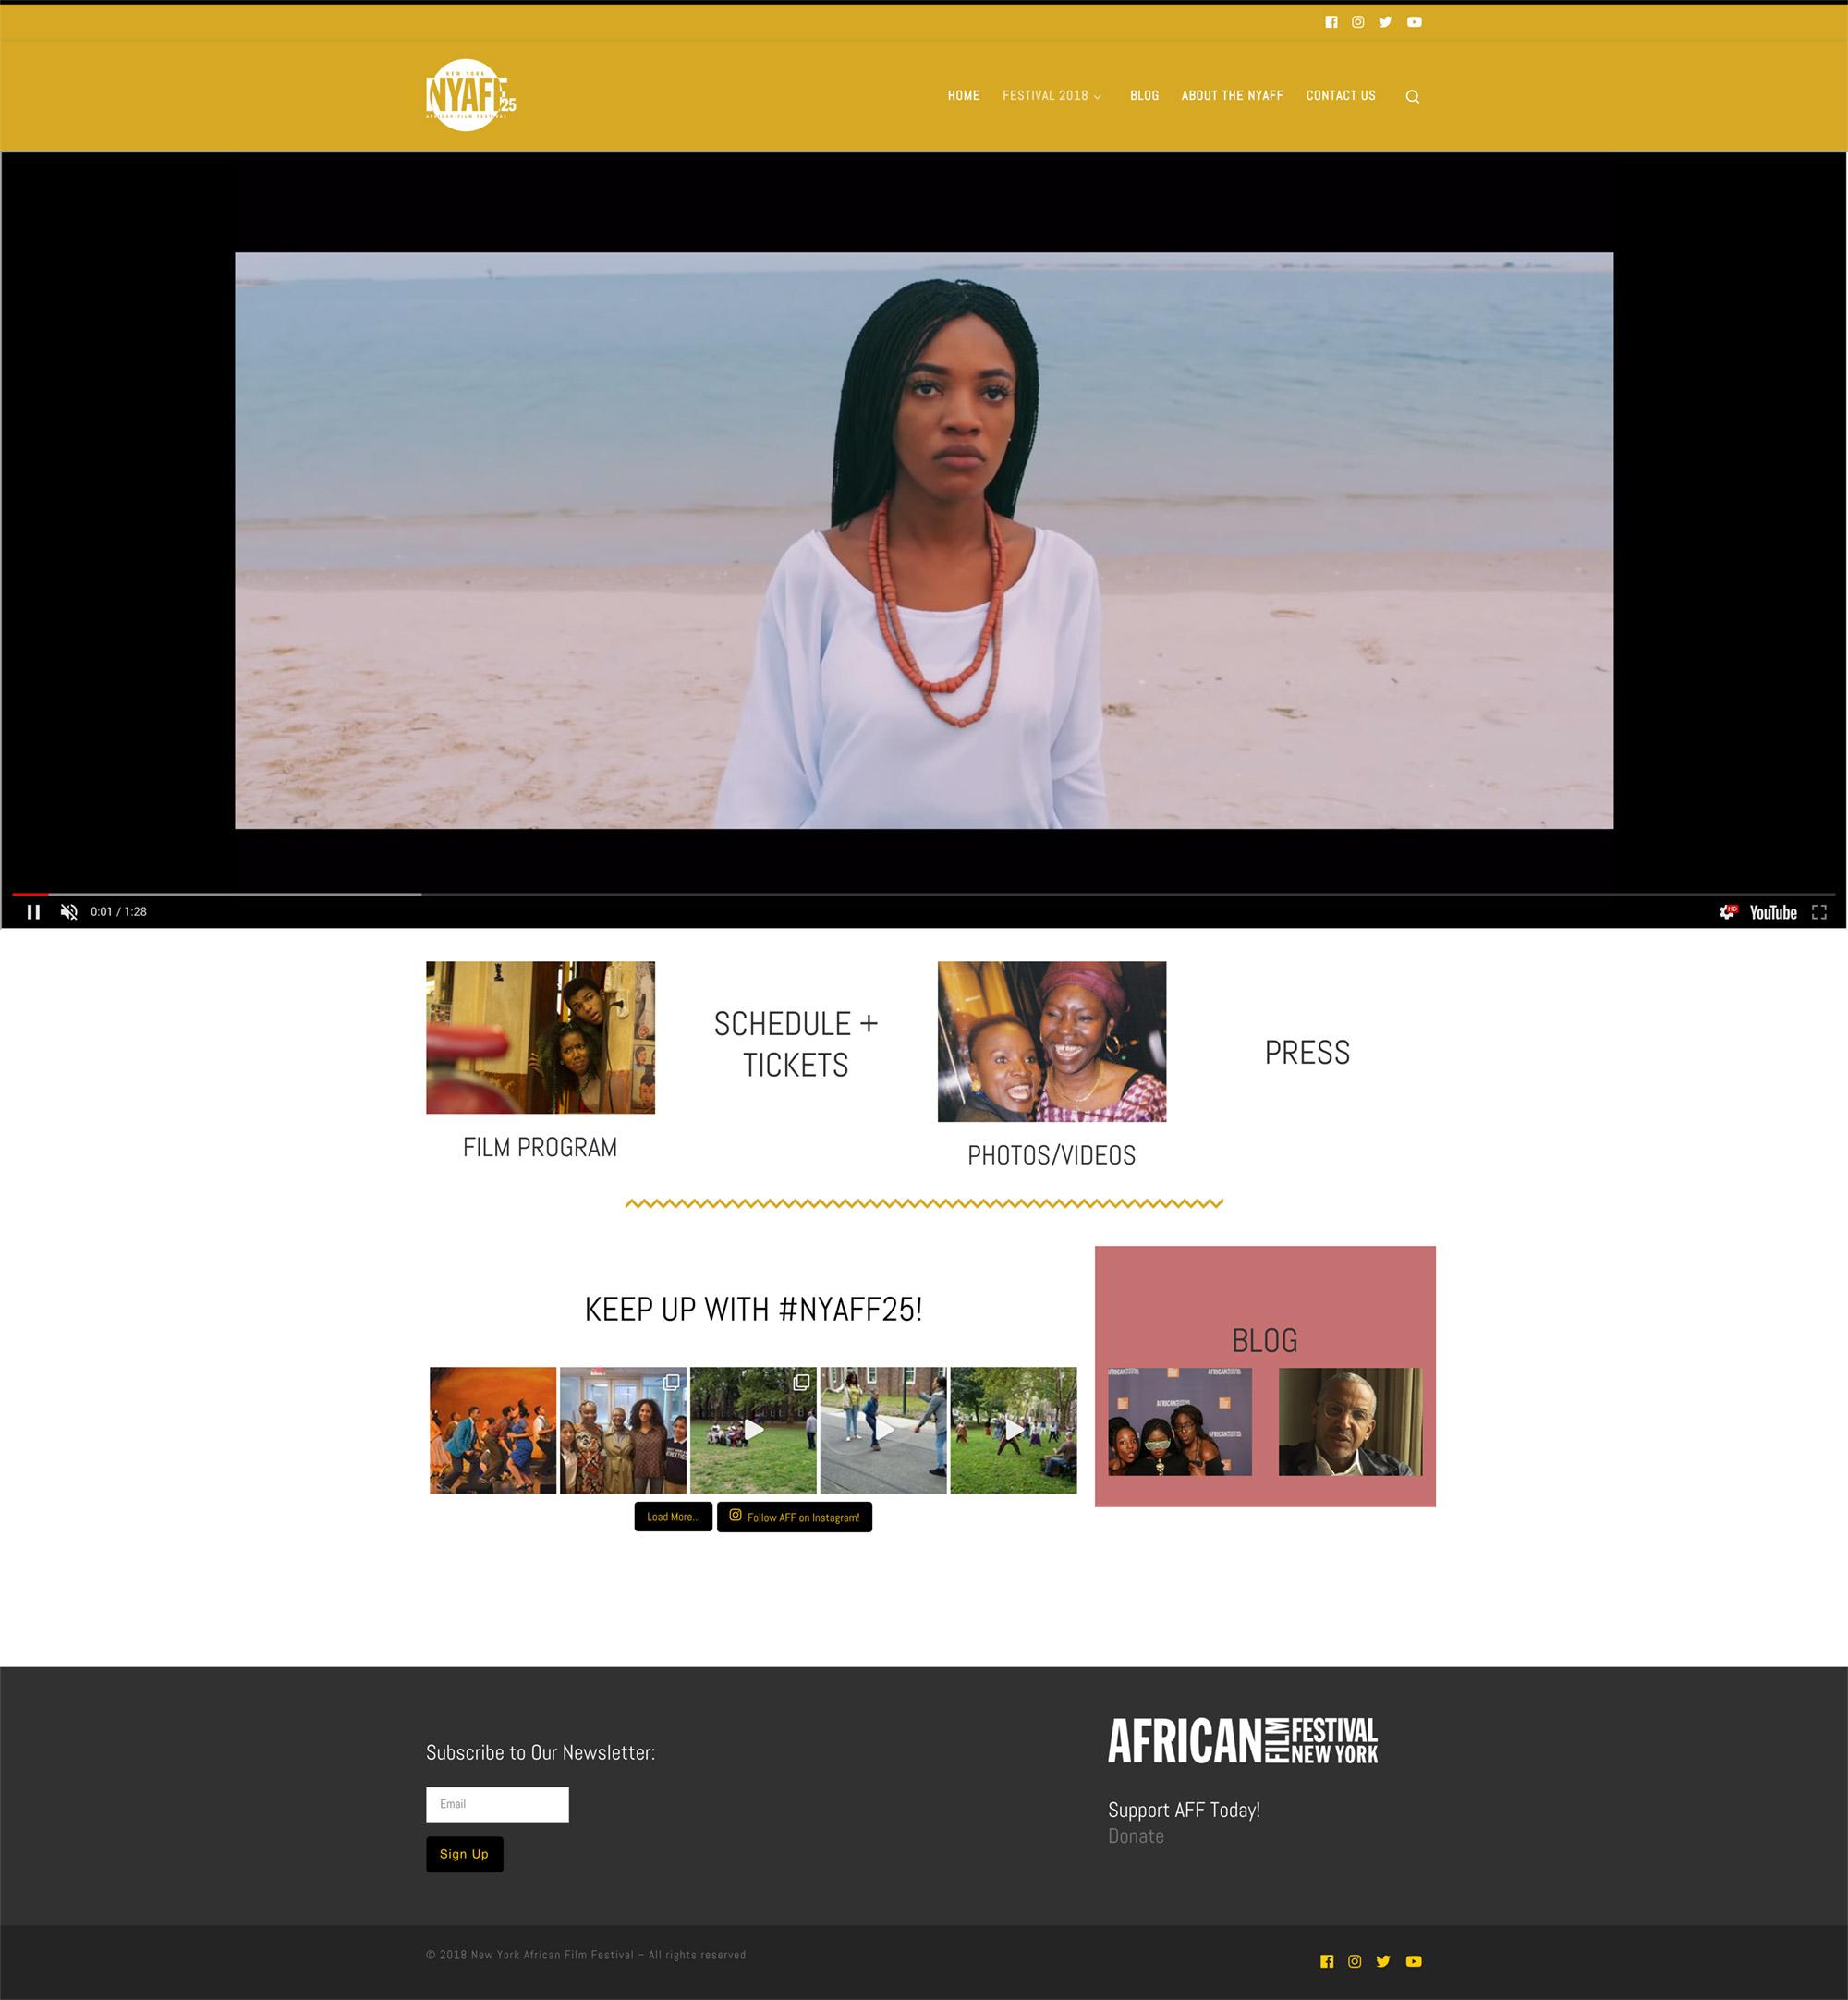 African Film Festival 2018 site